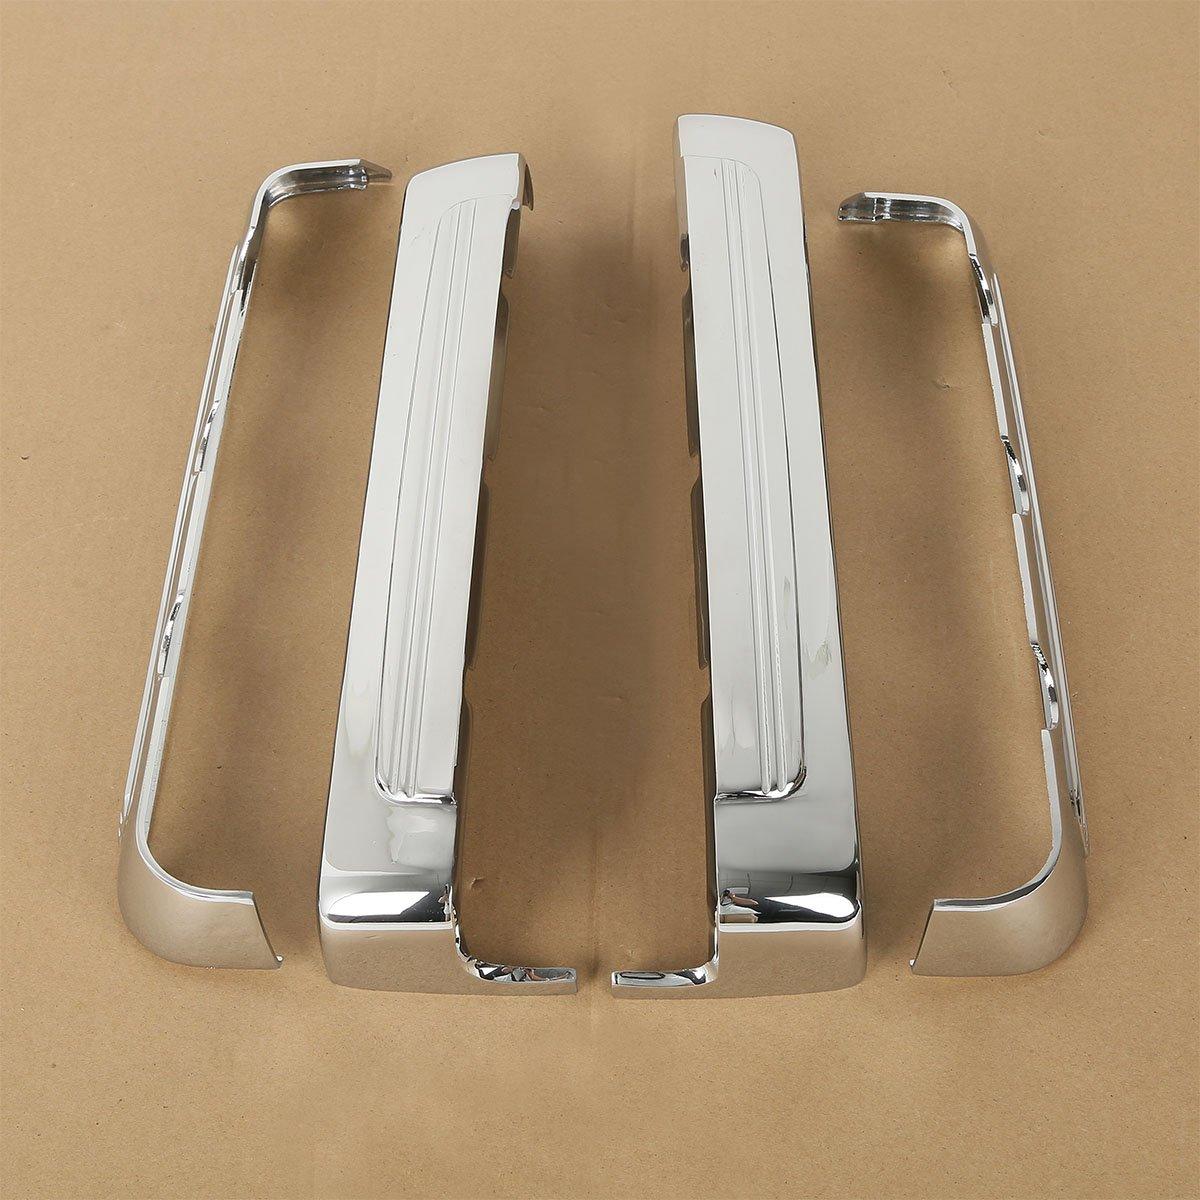 Replaces : 3901 XMT-MOTO Motor Chrome Lighting Valve Covers Kit For Honda Goldwing GL 1800 Trike 2001 2002 2003 2004 2005 2006 2007 2008 2009 2010 2012